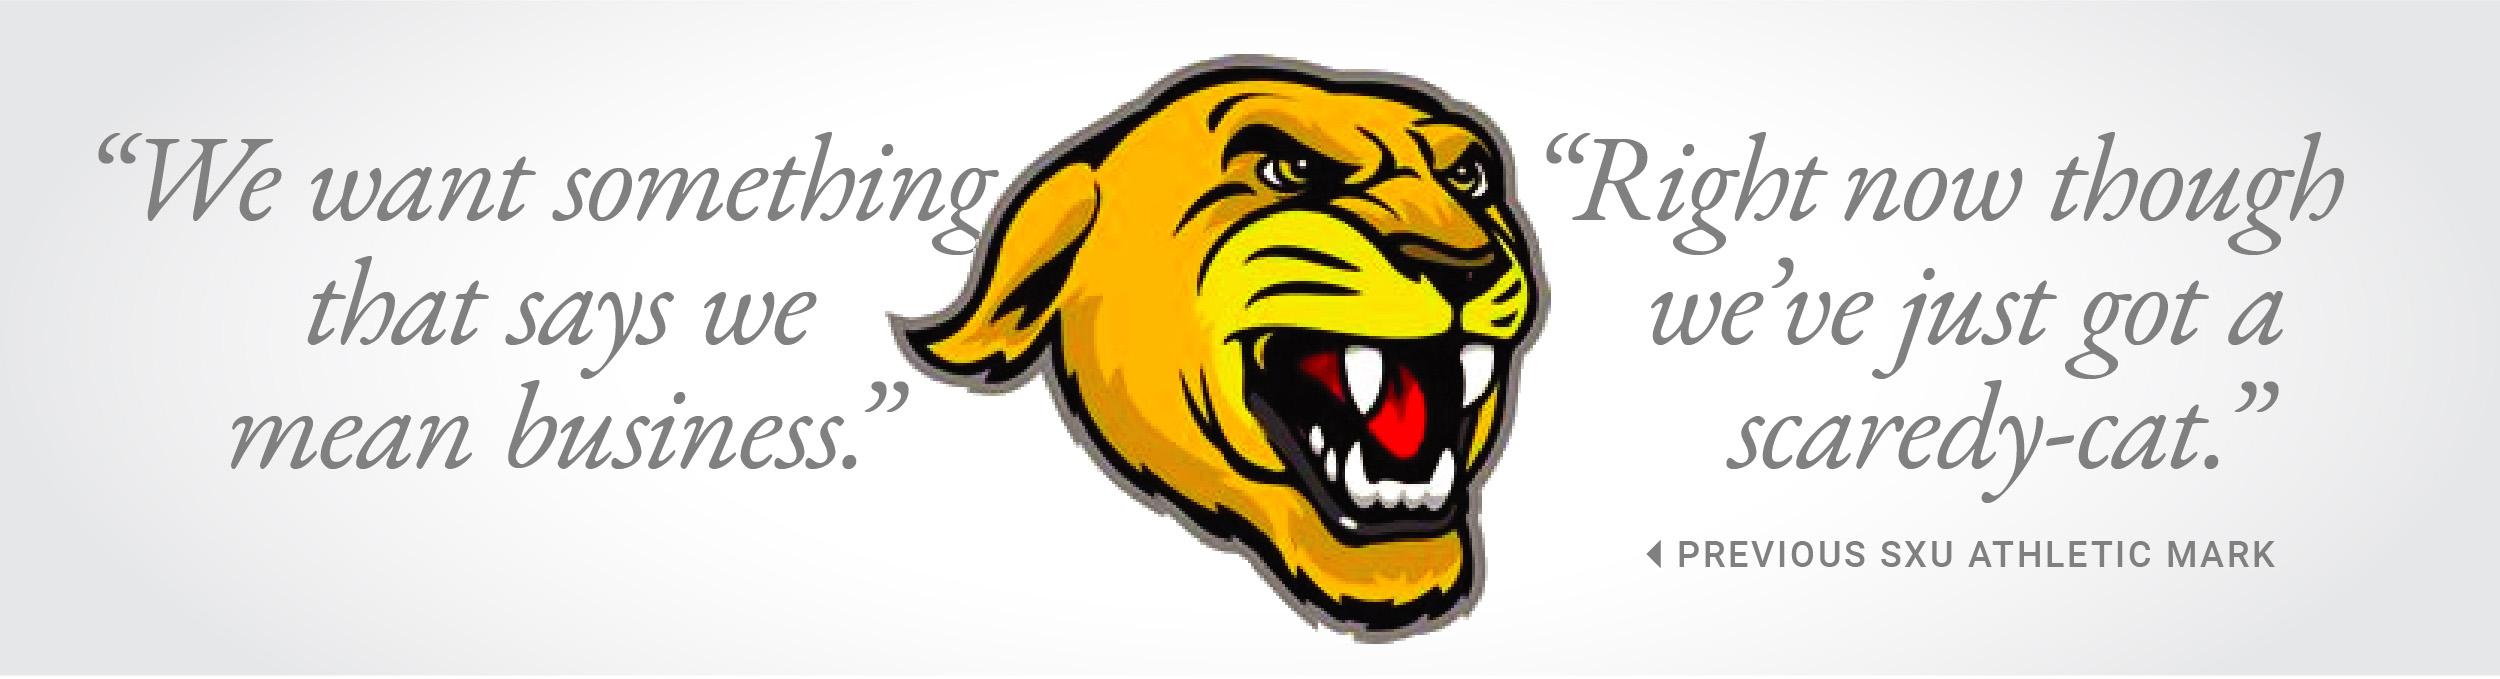 Previous Saint Xavier University's athletic logo